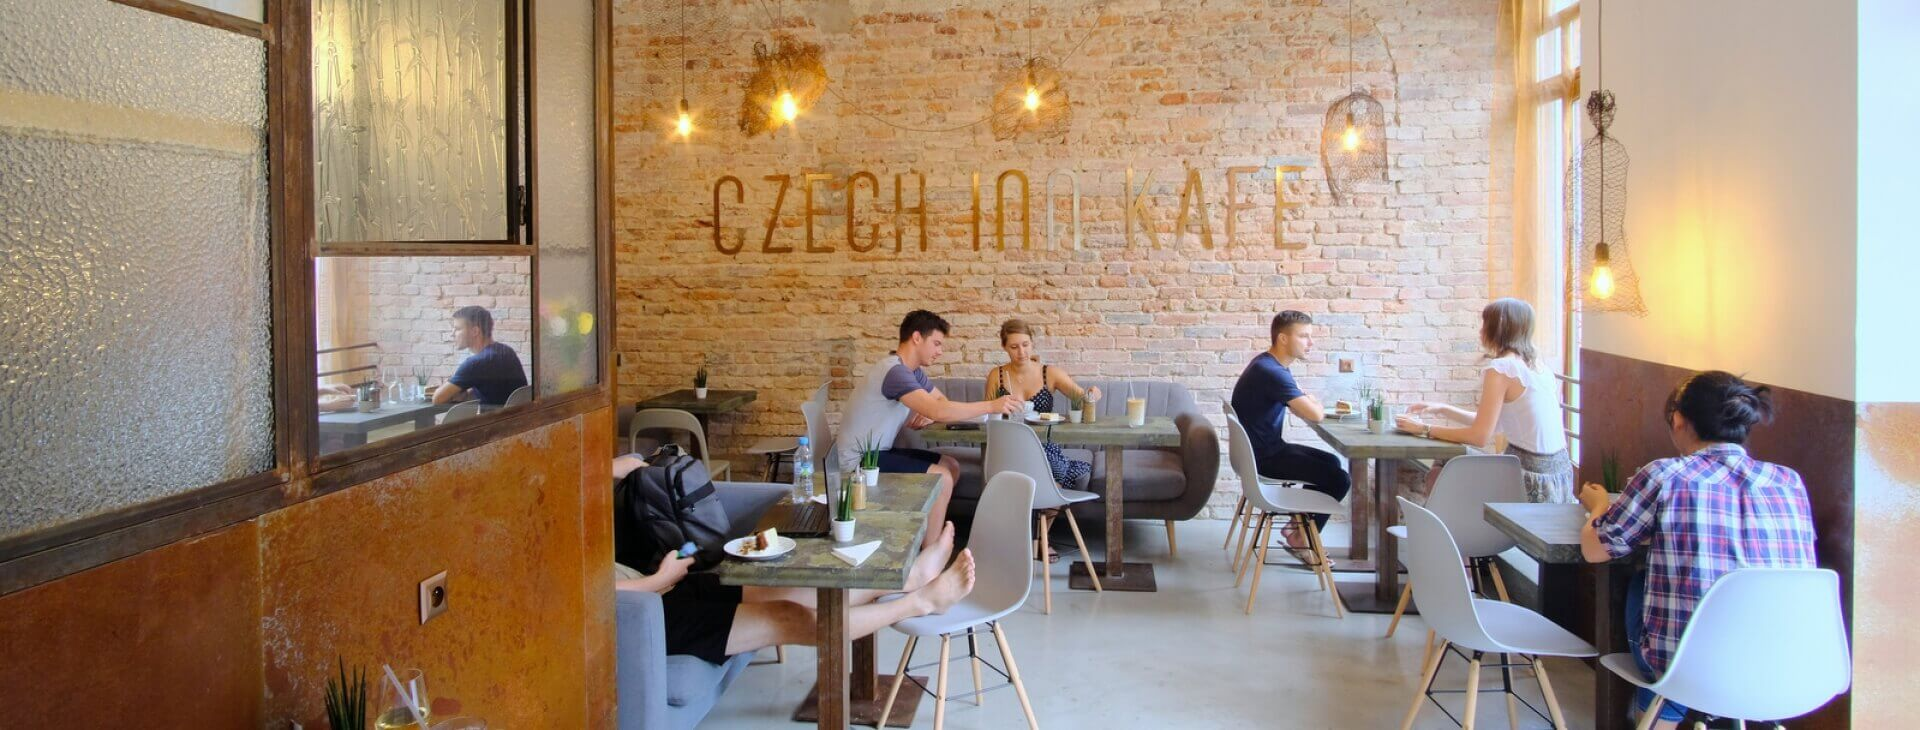 Czech Inn Hostel Prague | offering AFFORDABLE LUXURY